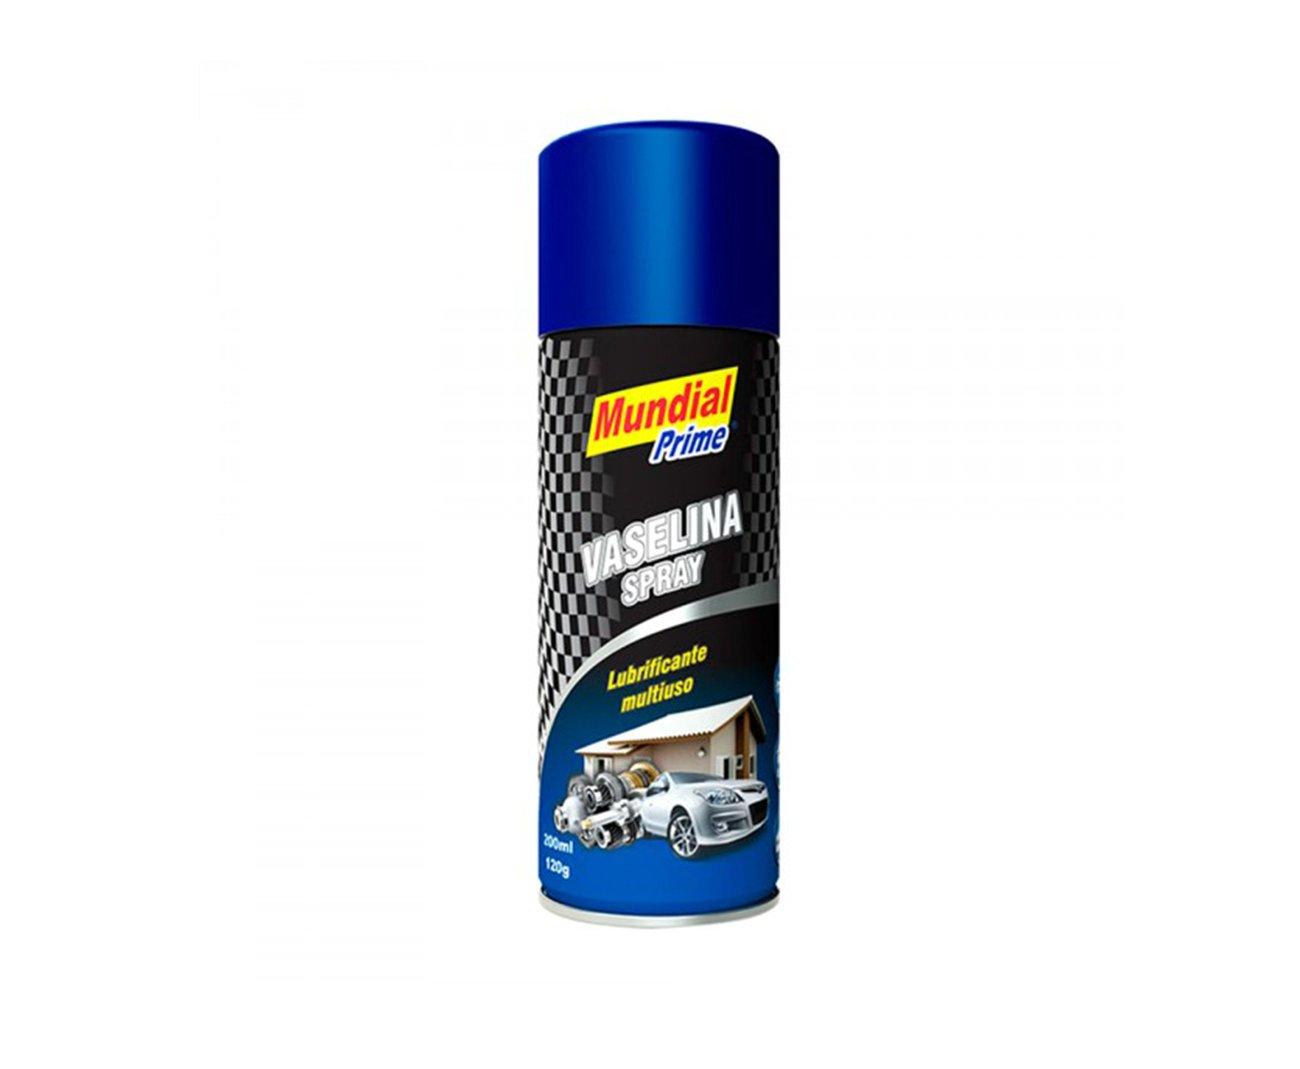 Vaselina Spray 200ml - Mundial Prime